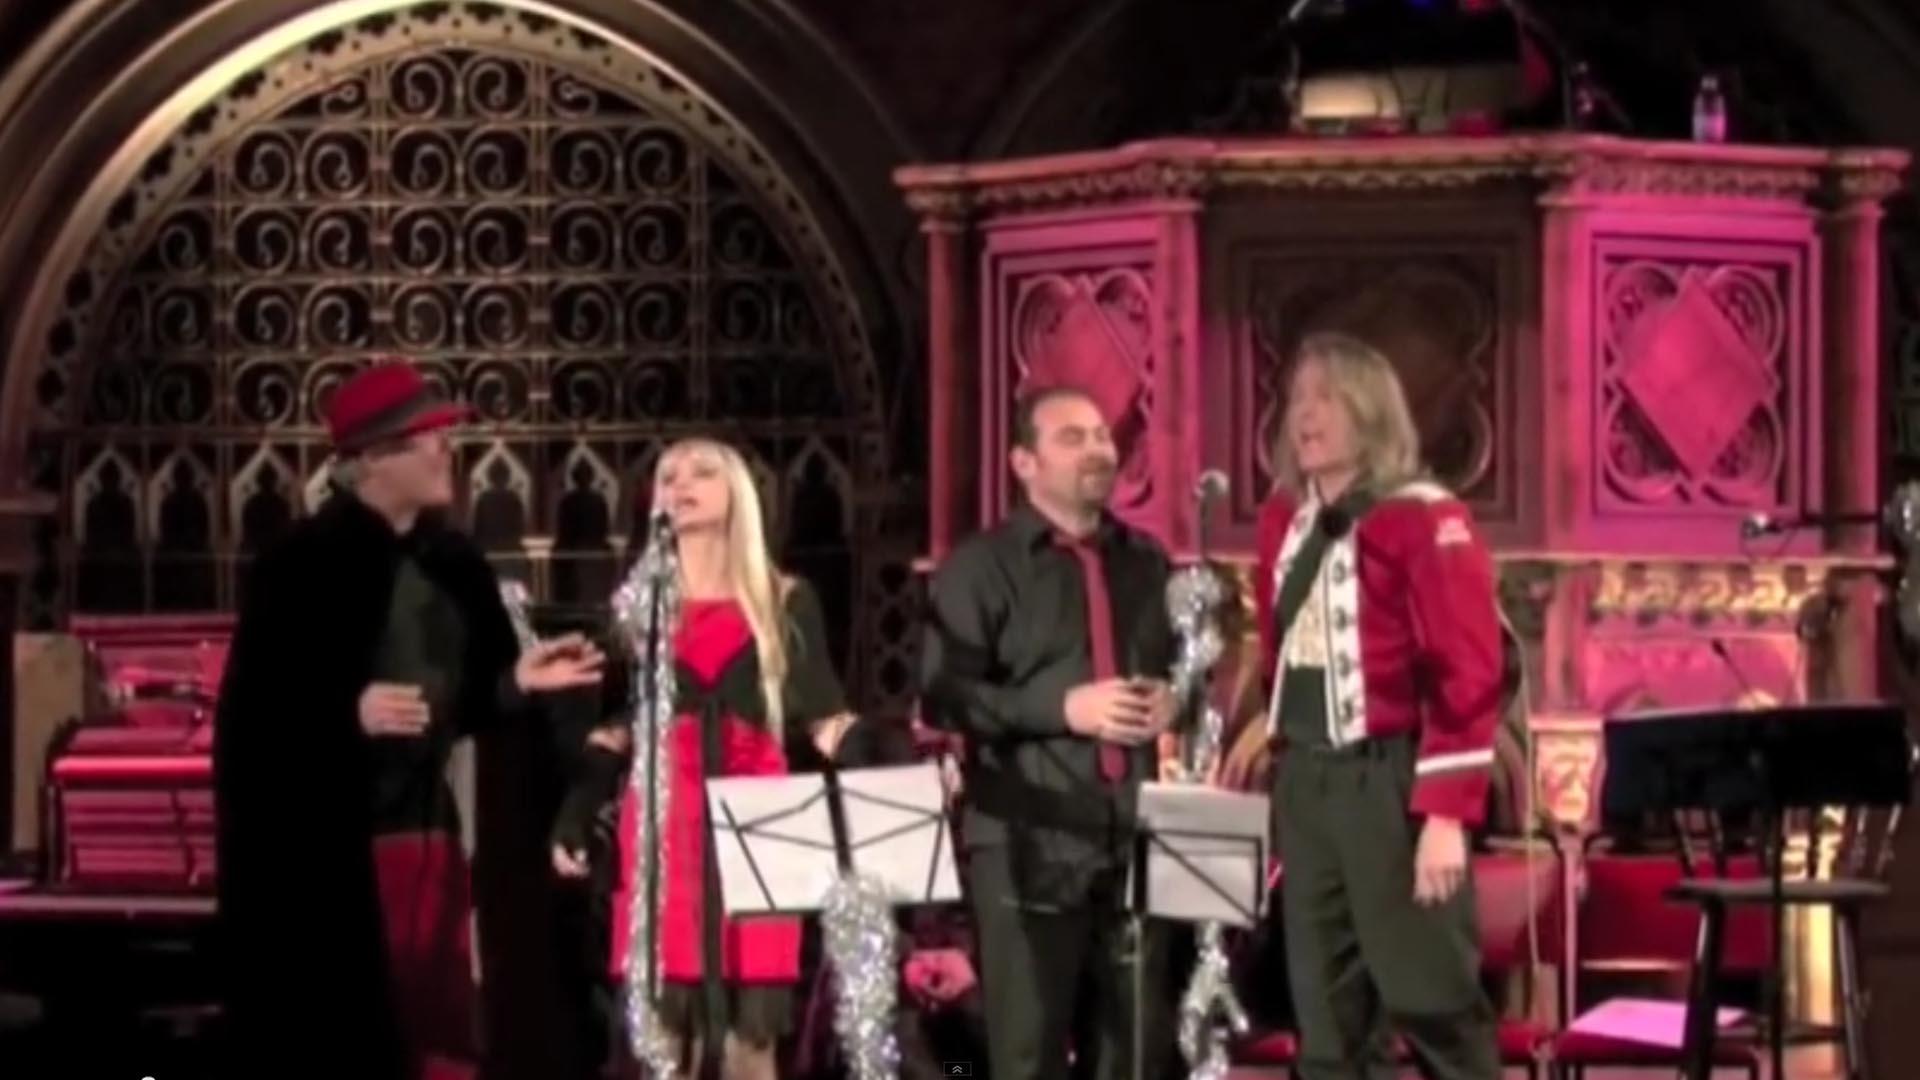 A_Christmas_Carol_Unplugged_with_Noddy_Holder_-_Gaudete_